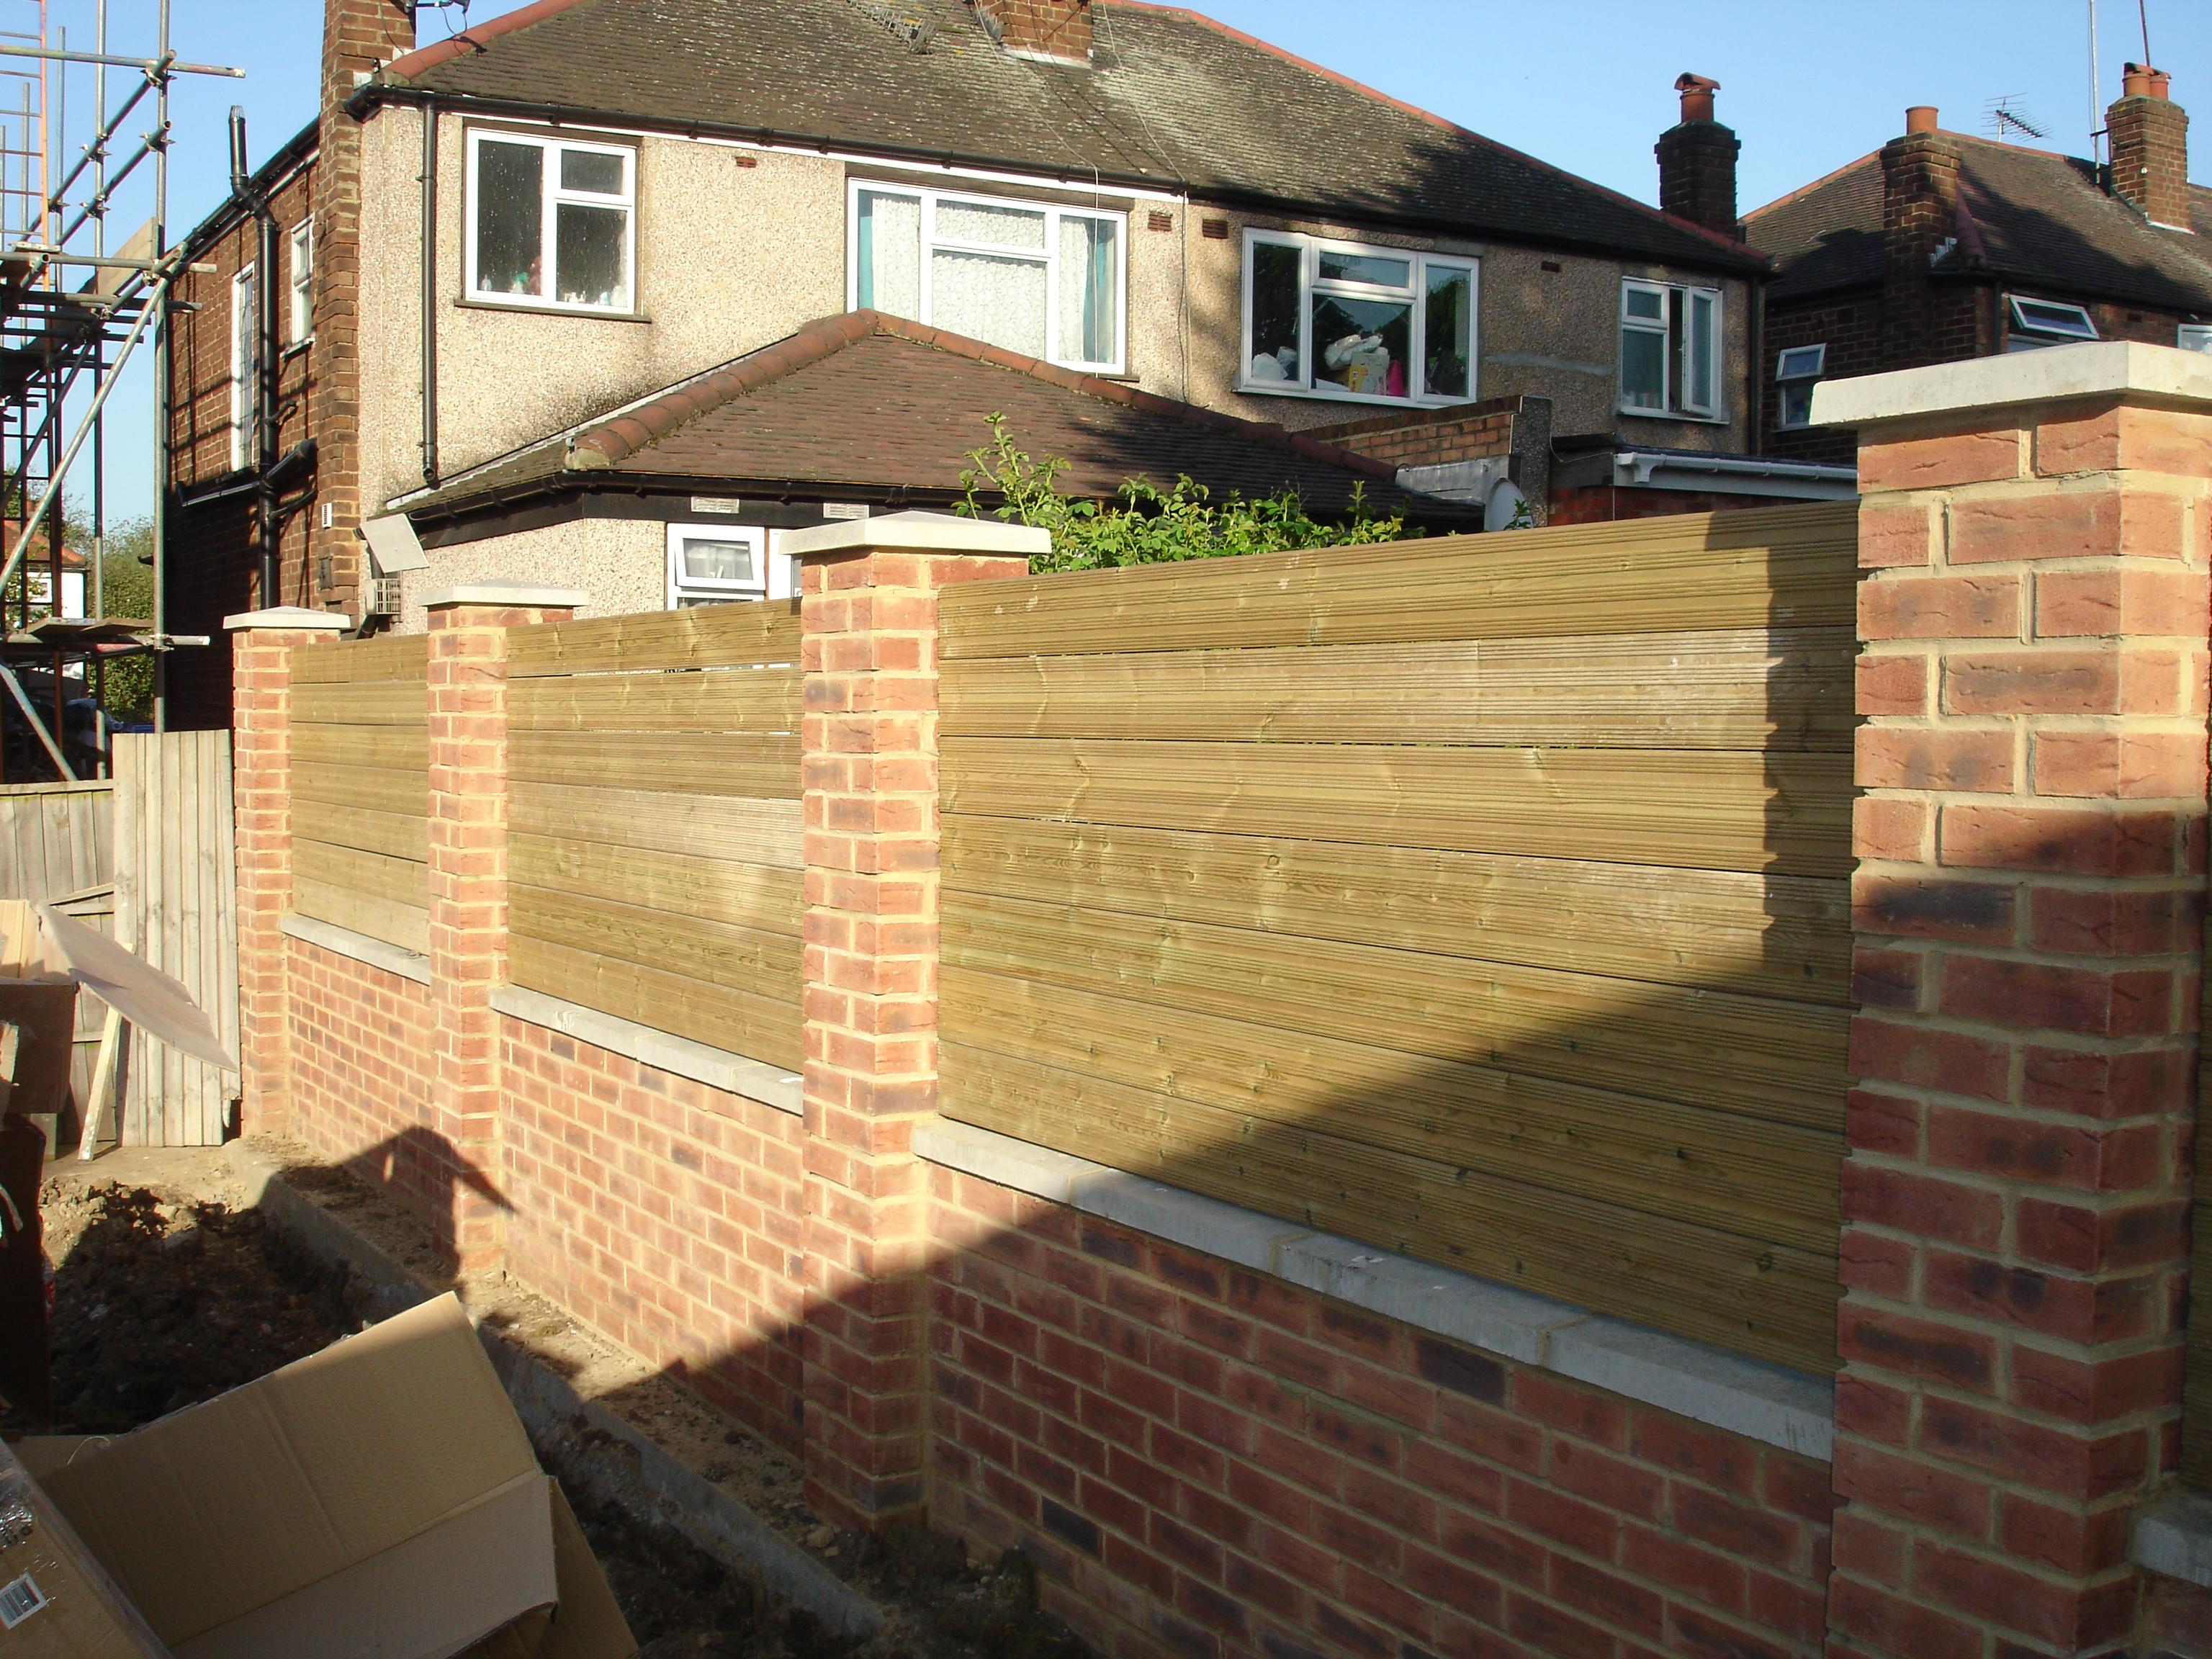 Fine Decorative Brick Walls Garden Pattern - The Wall Art ...